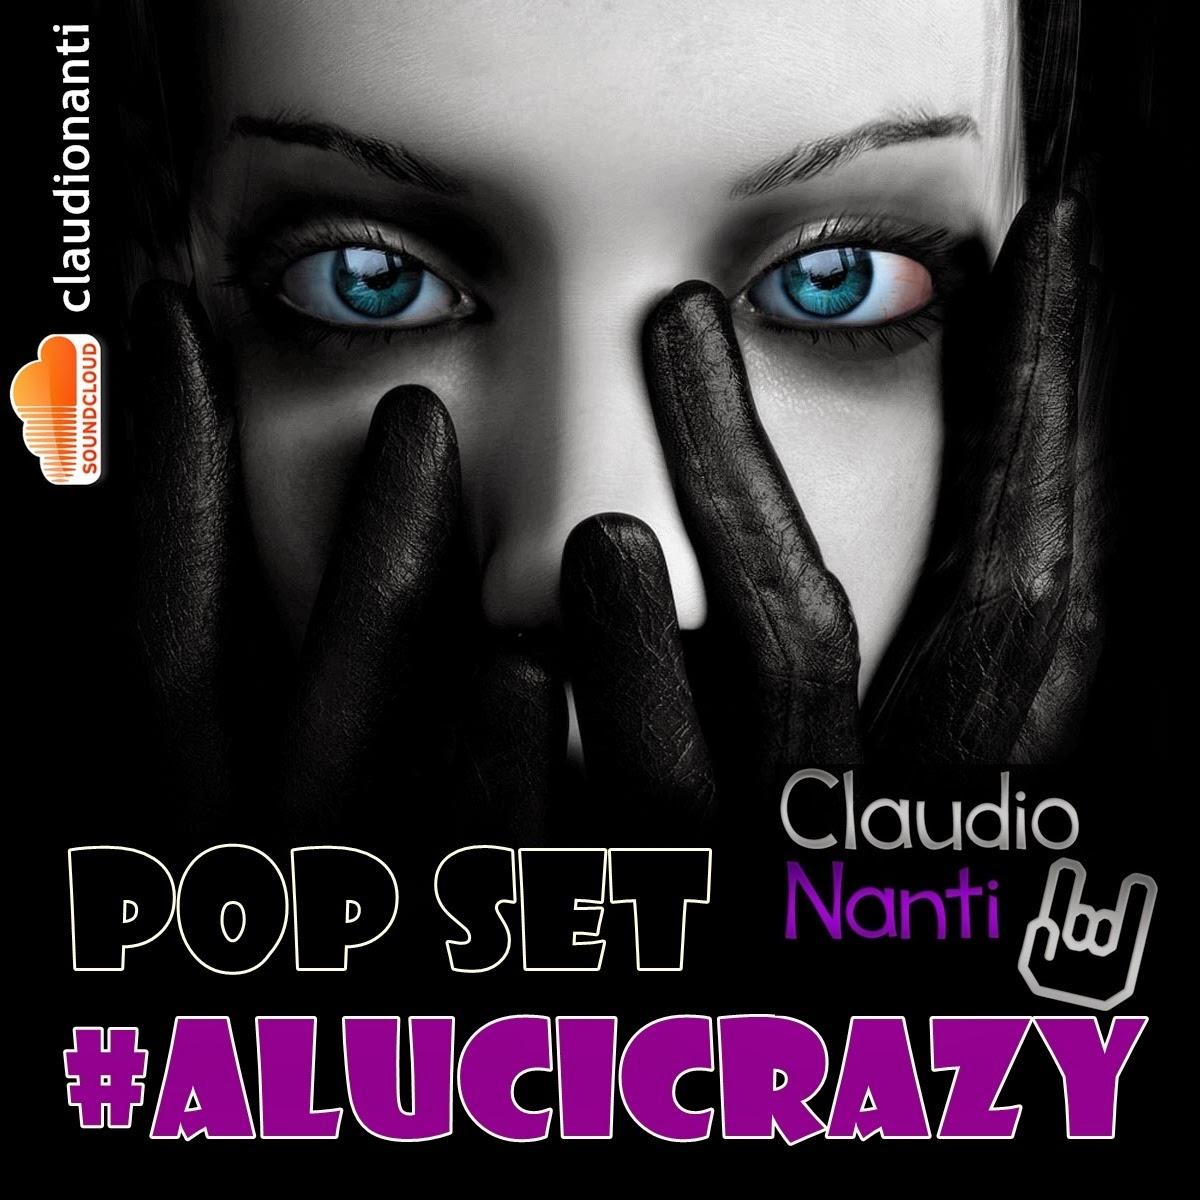 DJ Claudio Nanti - Pop Set #ALUCICRAZY